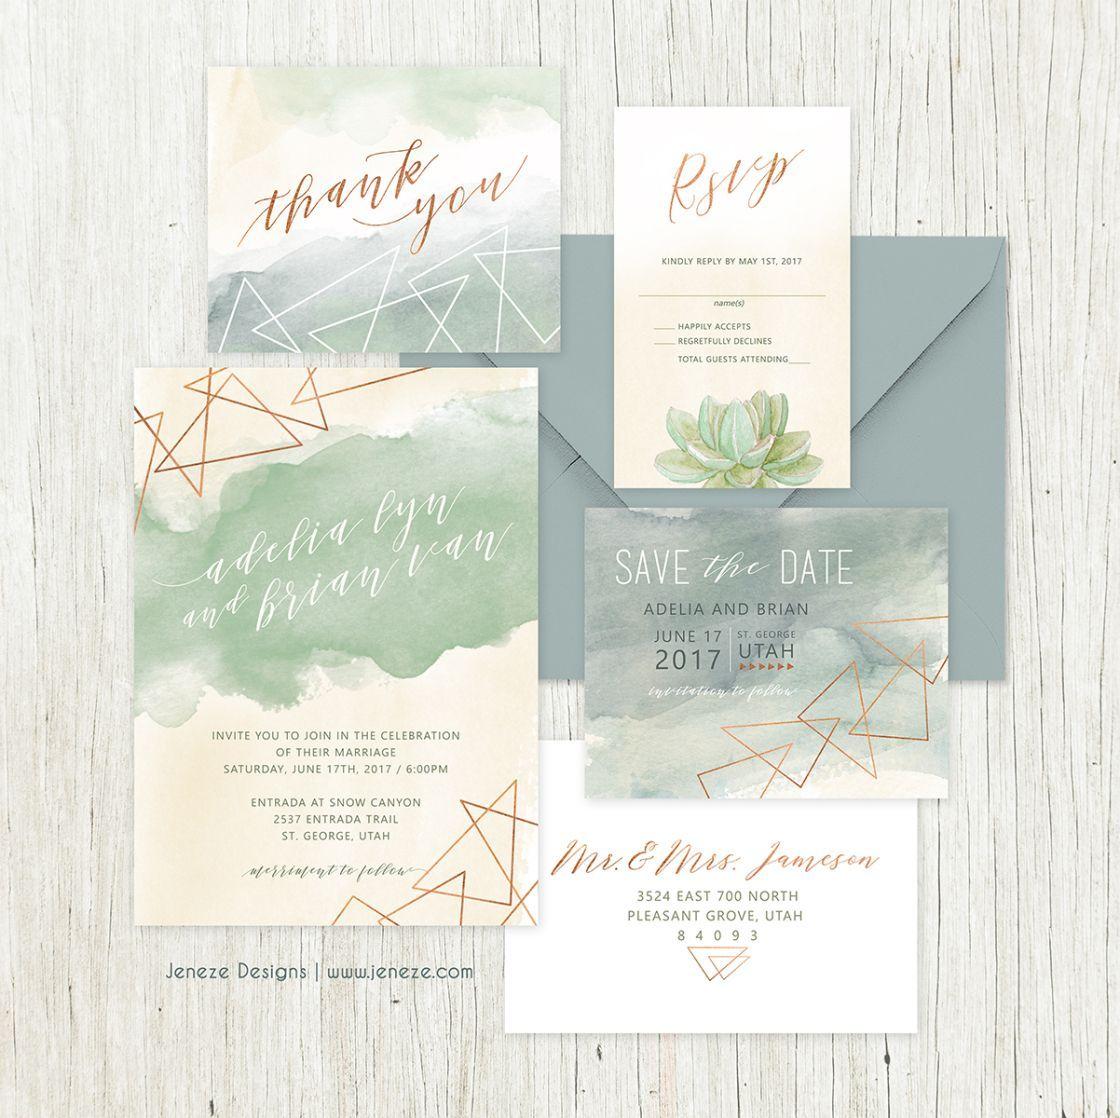 Copper And Watercolor Custom Wedding Invitation Suite